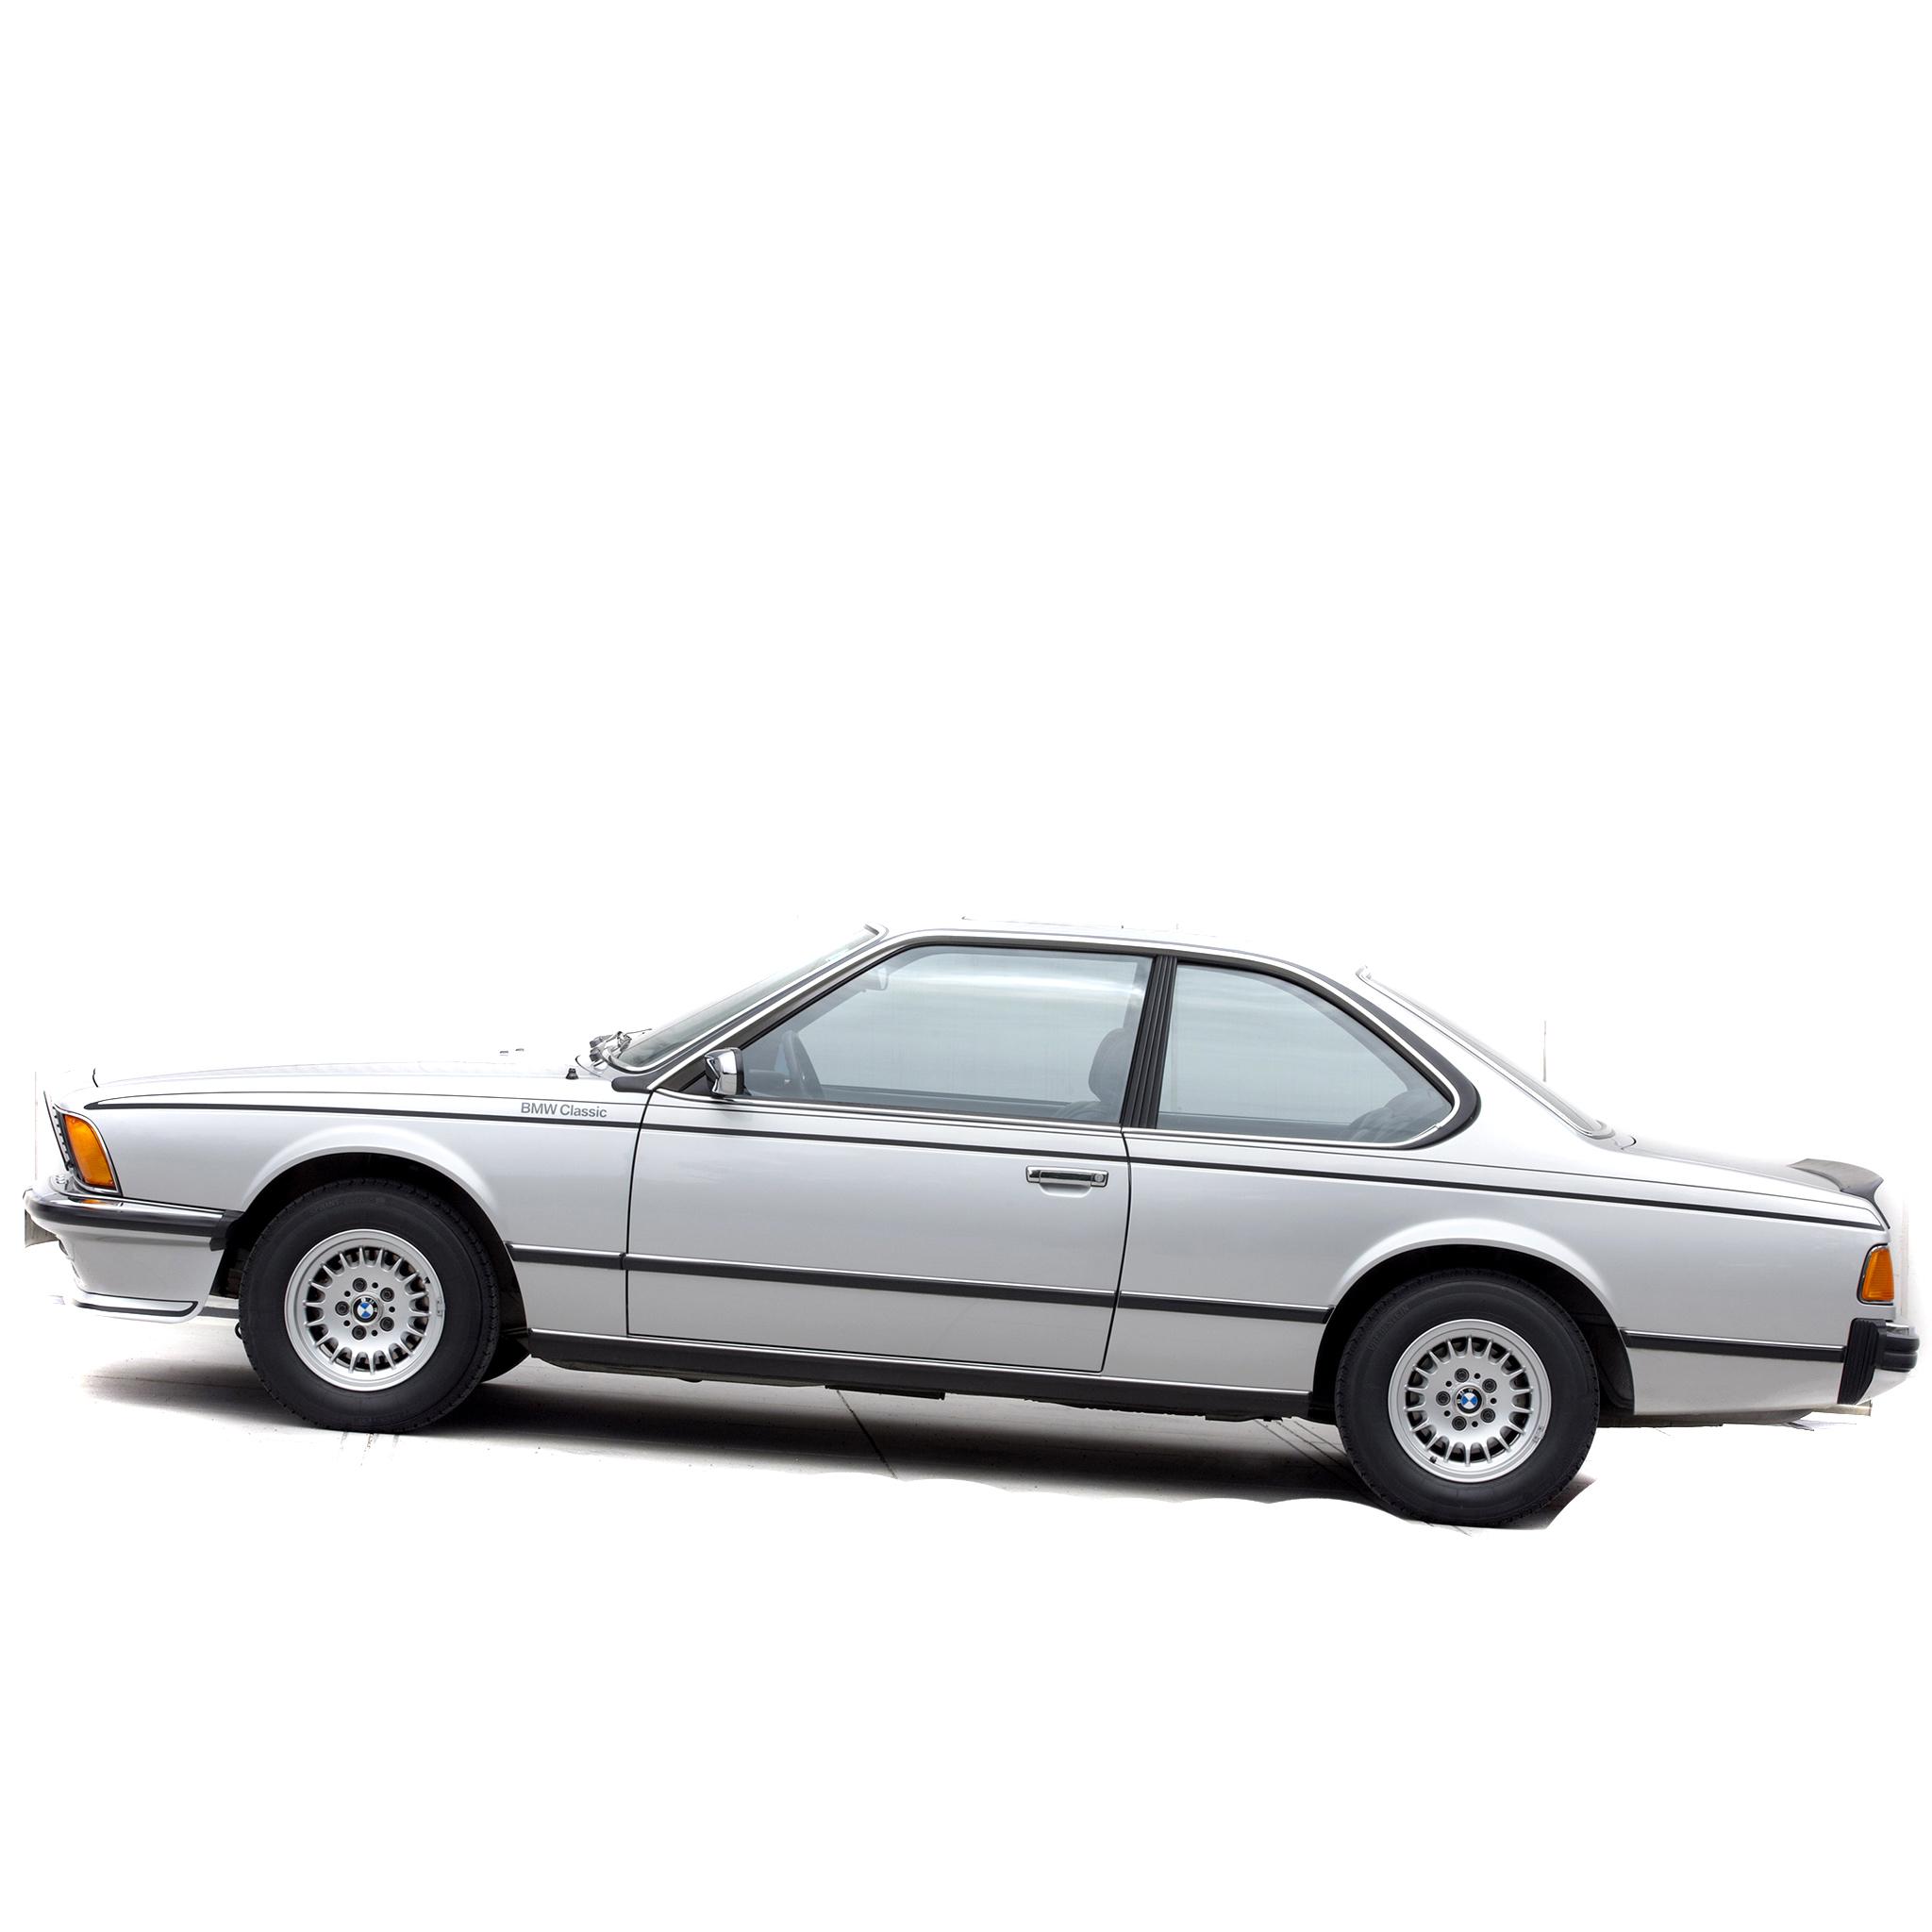 BMW 6 Series (E24) 1976 - 1989